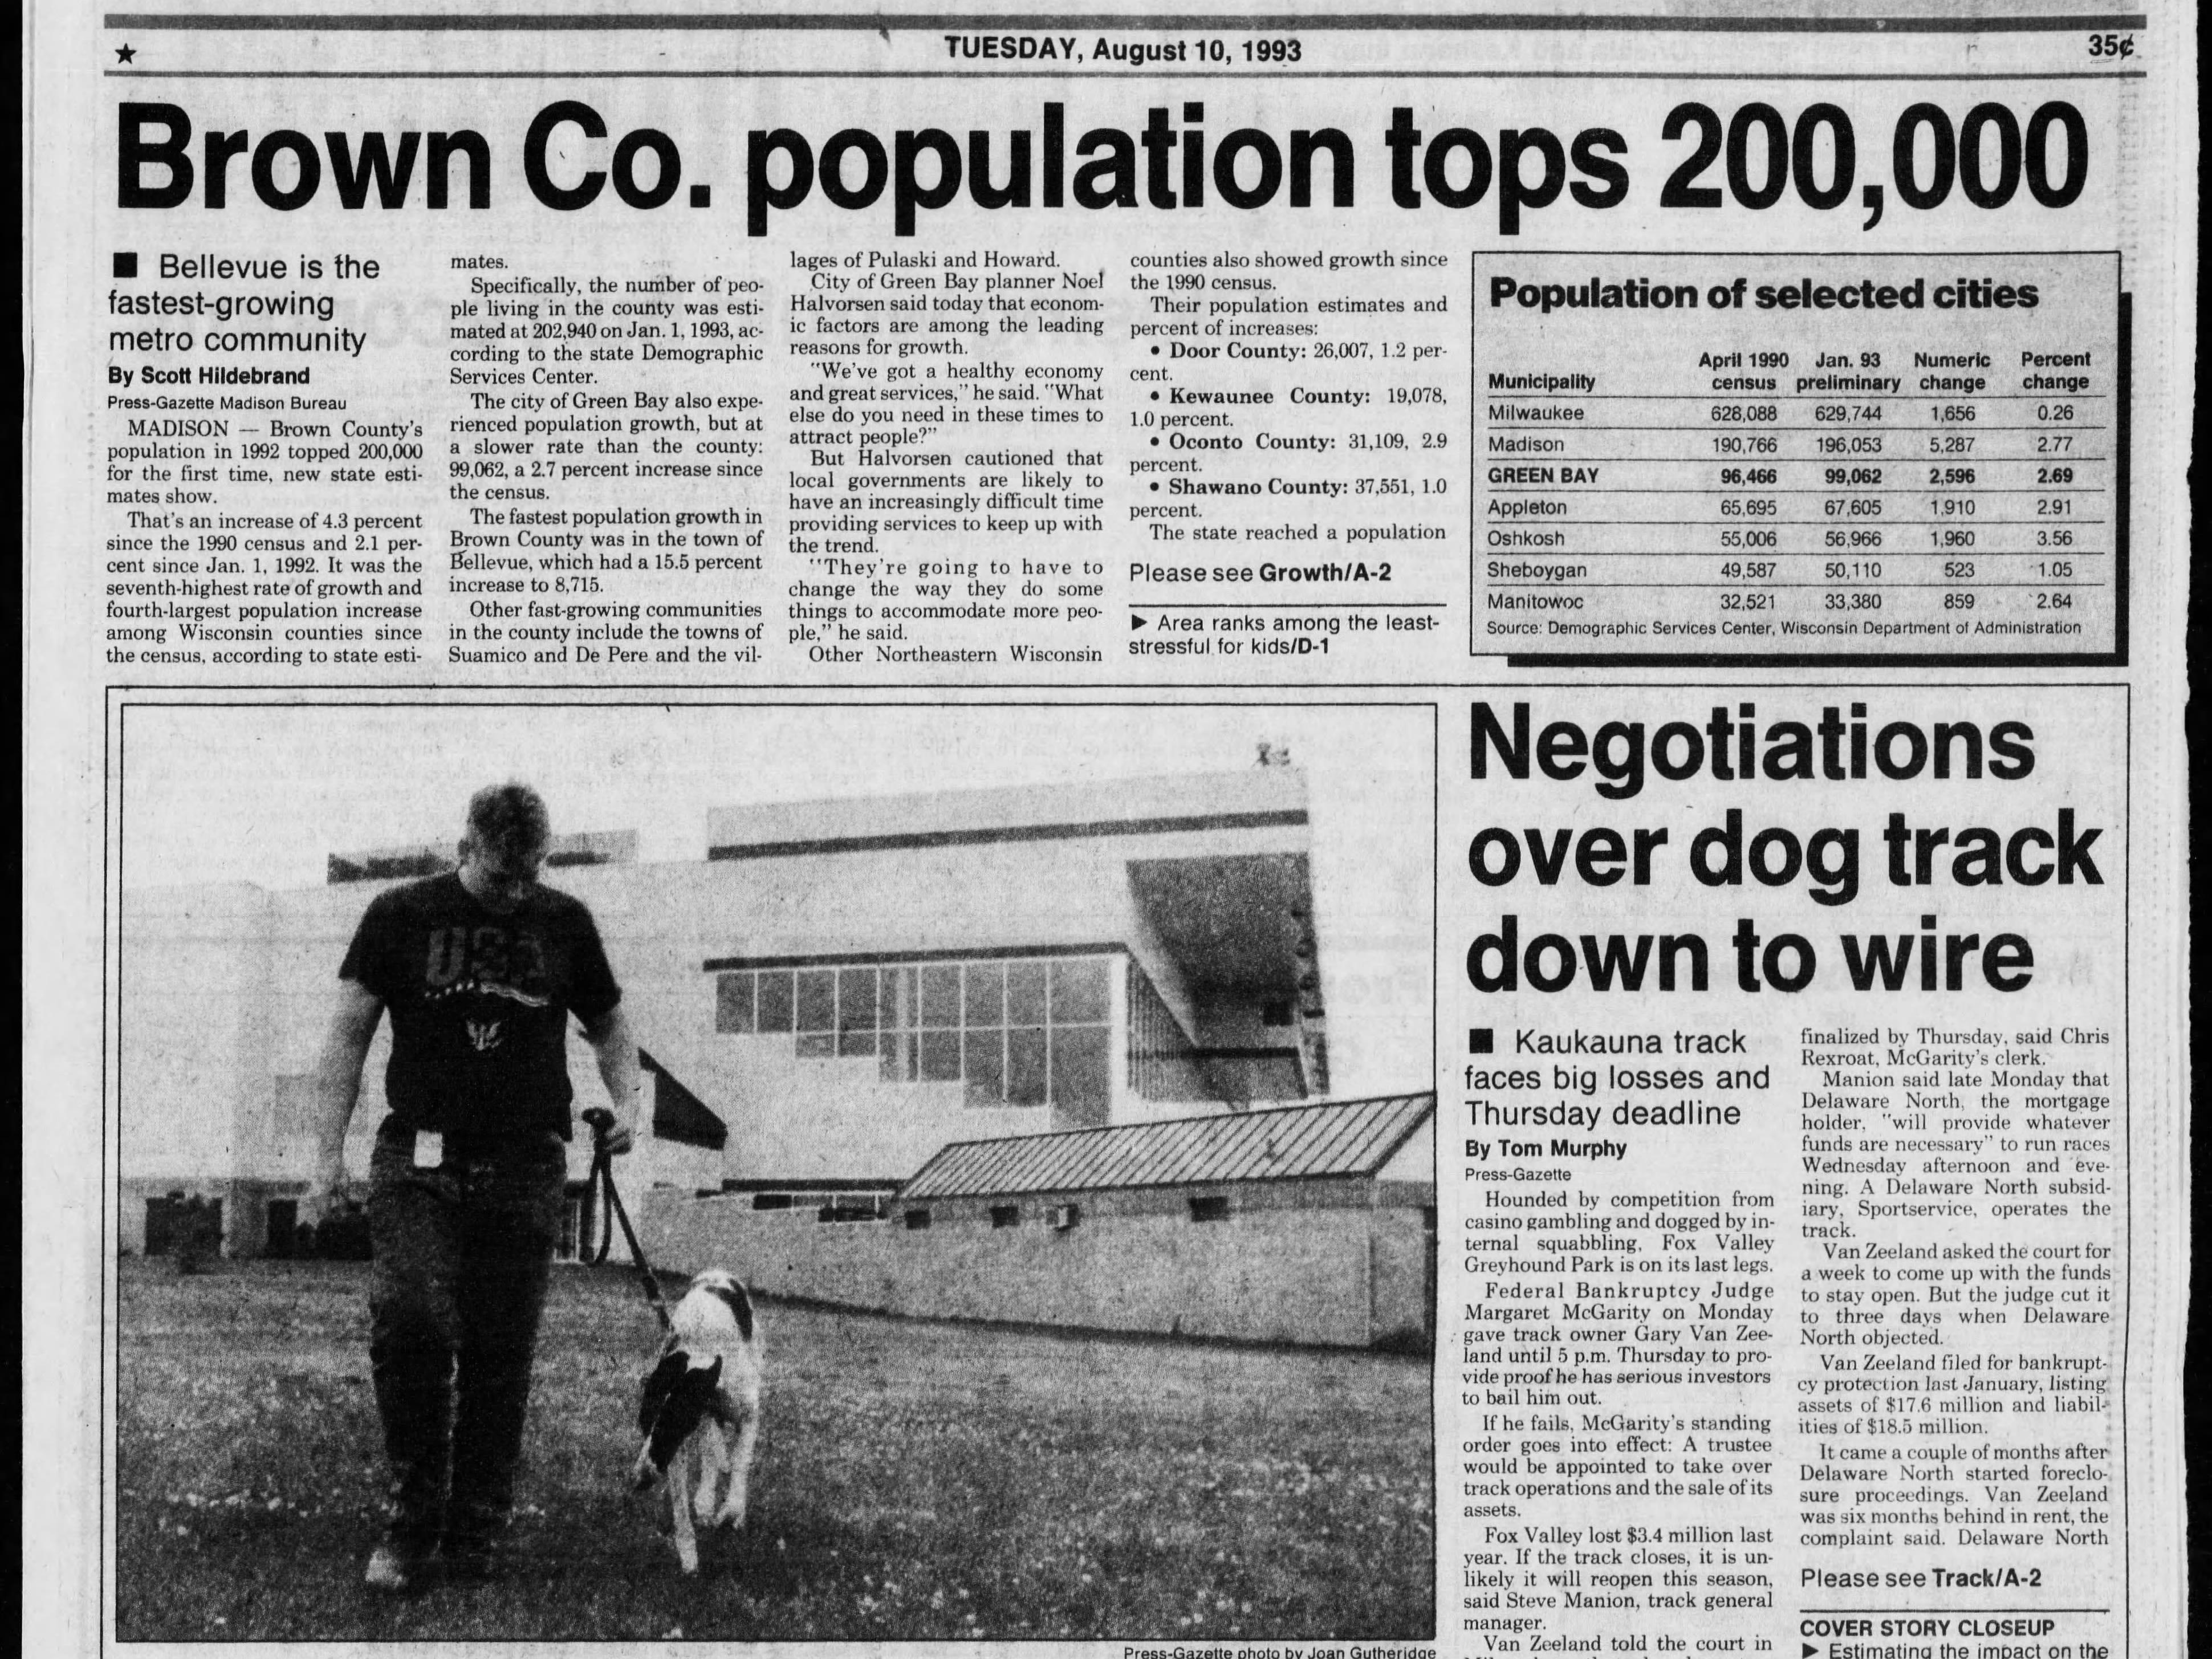 Aug. 10, 1993